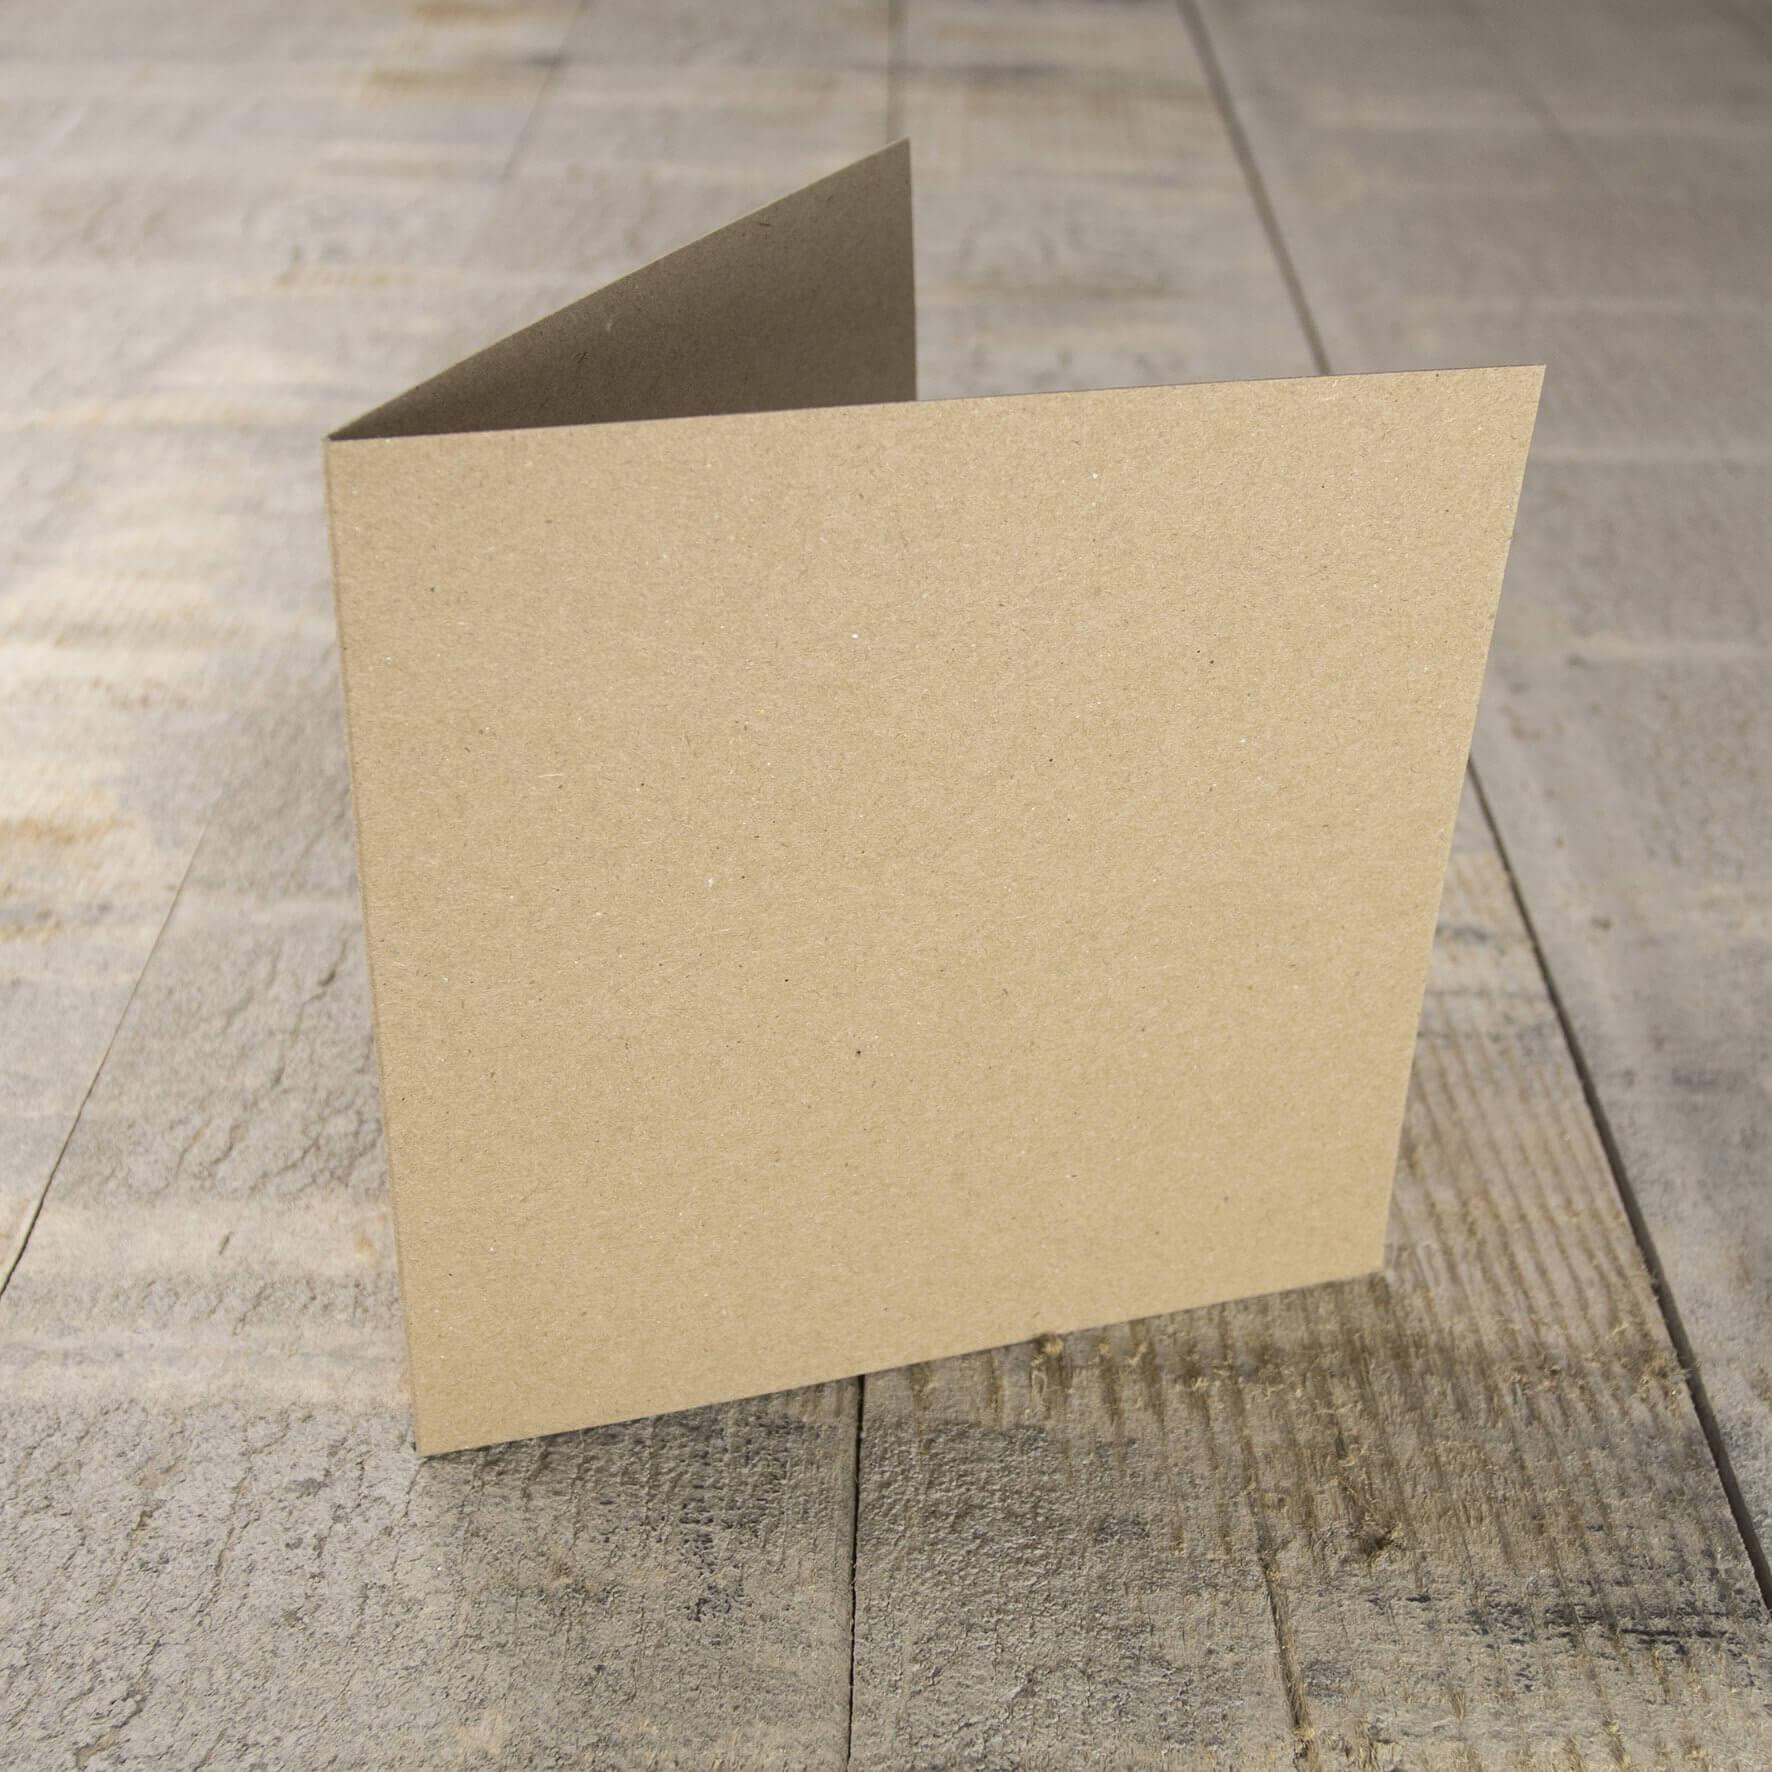 Creased Card Small Square - Kraft